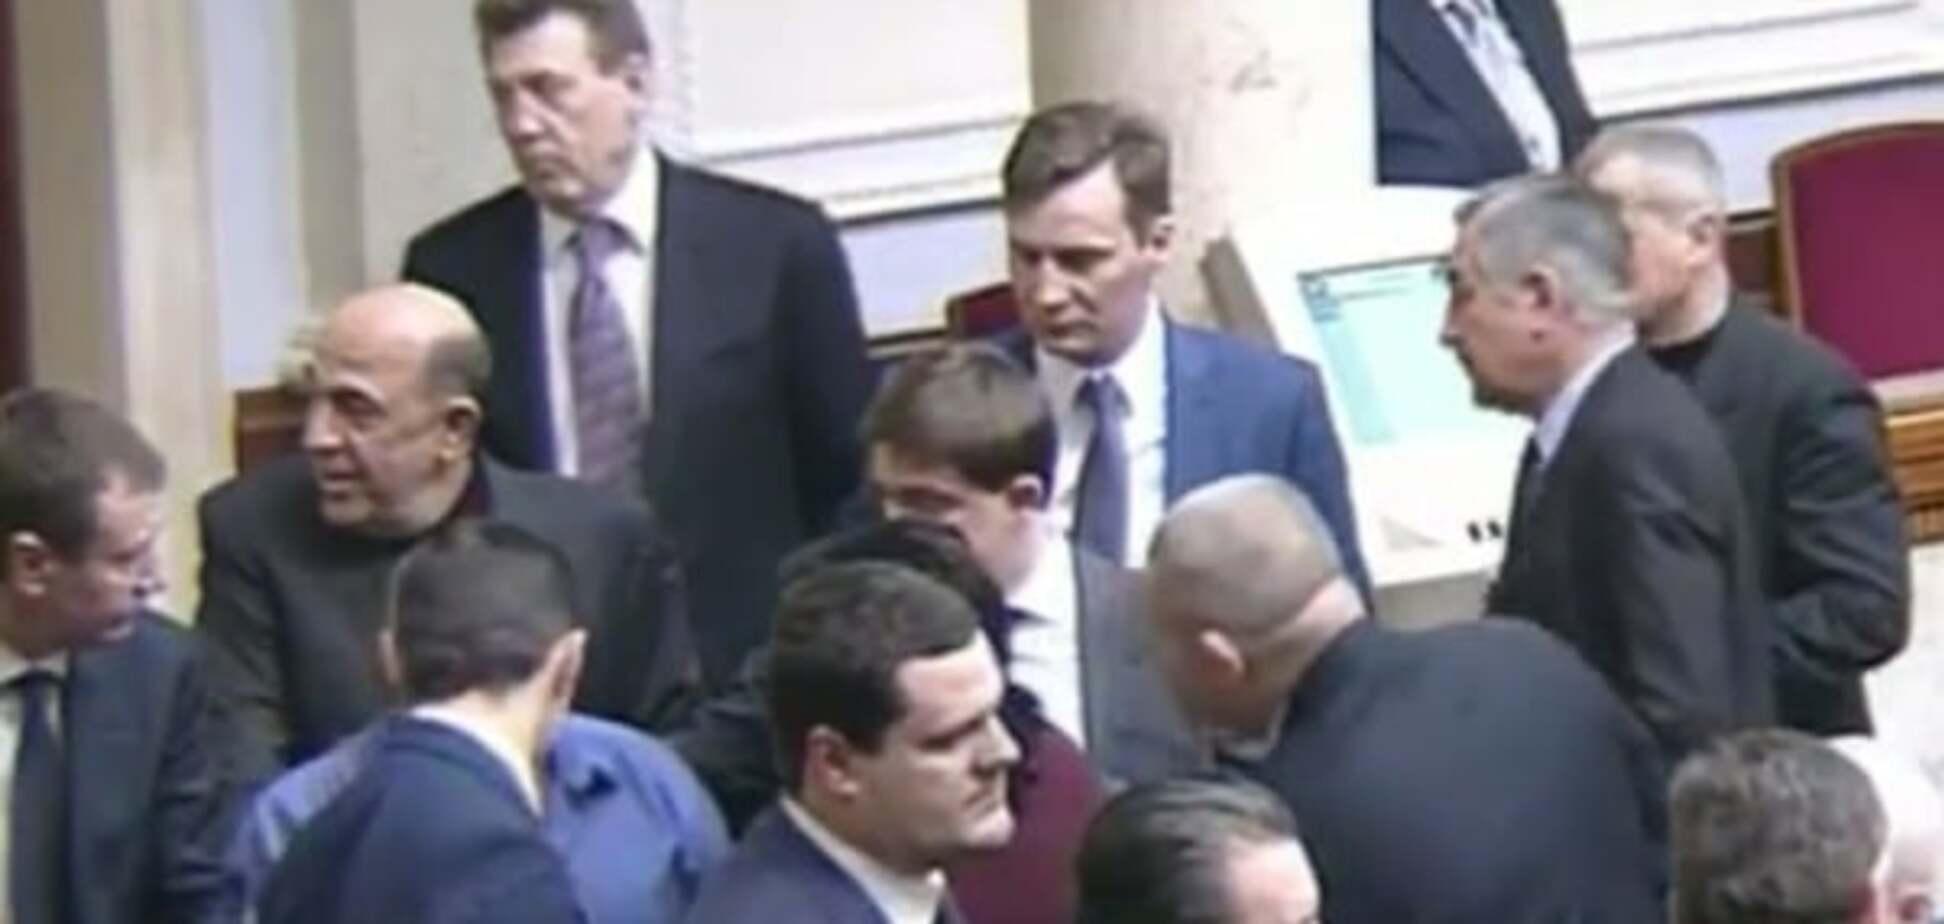 Ледве не побилися: нардепів обурив законопроект по спецконфіскацію майна